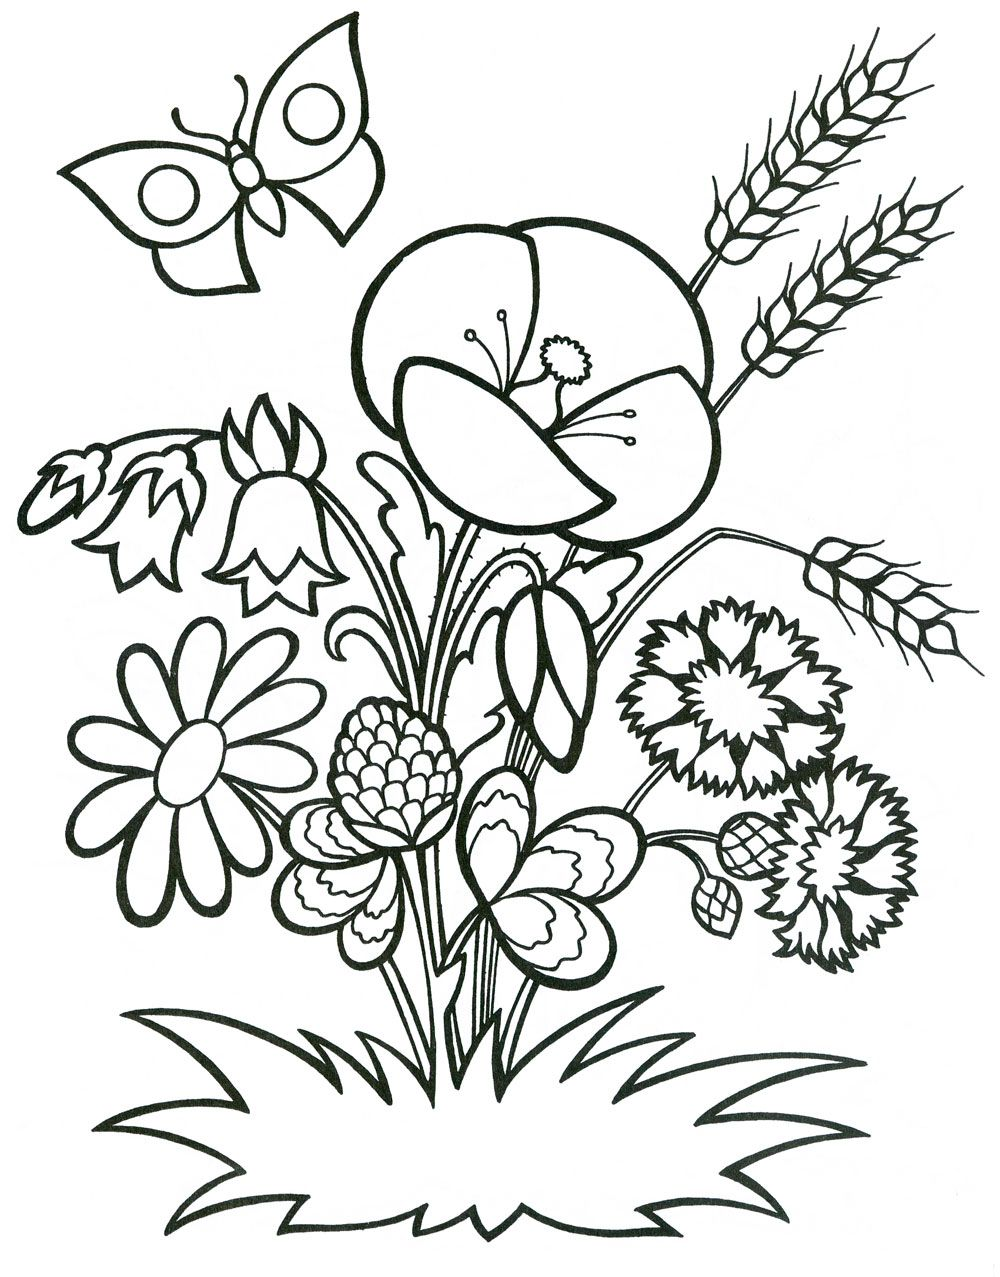 Pin von janaki bandari auf embroidery patterns | Pinterest ...